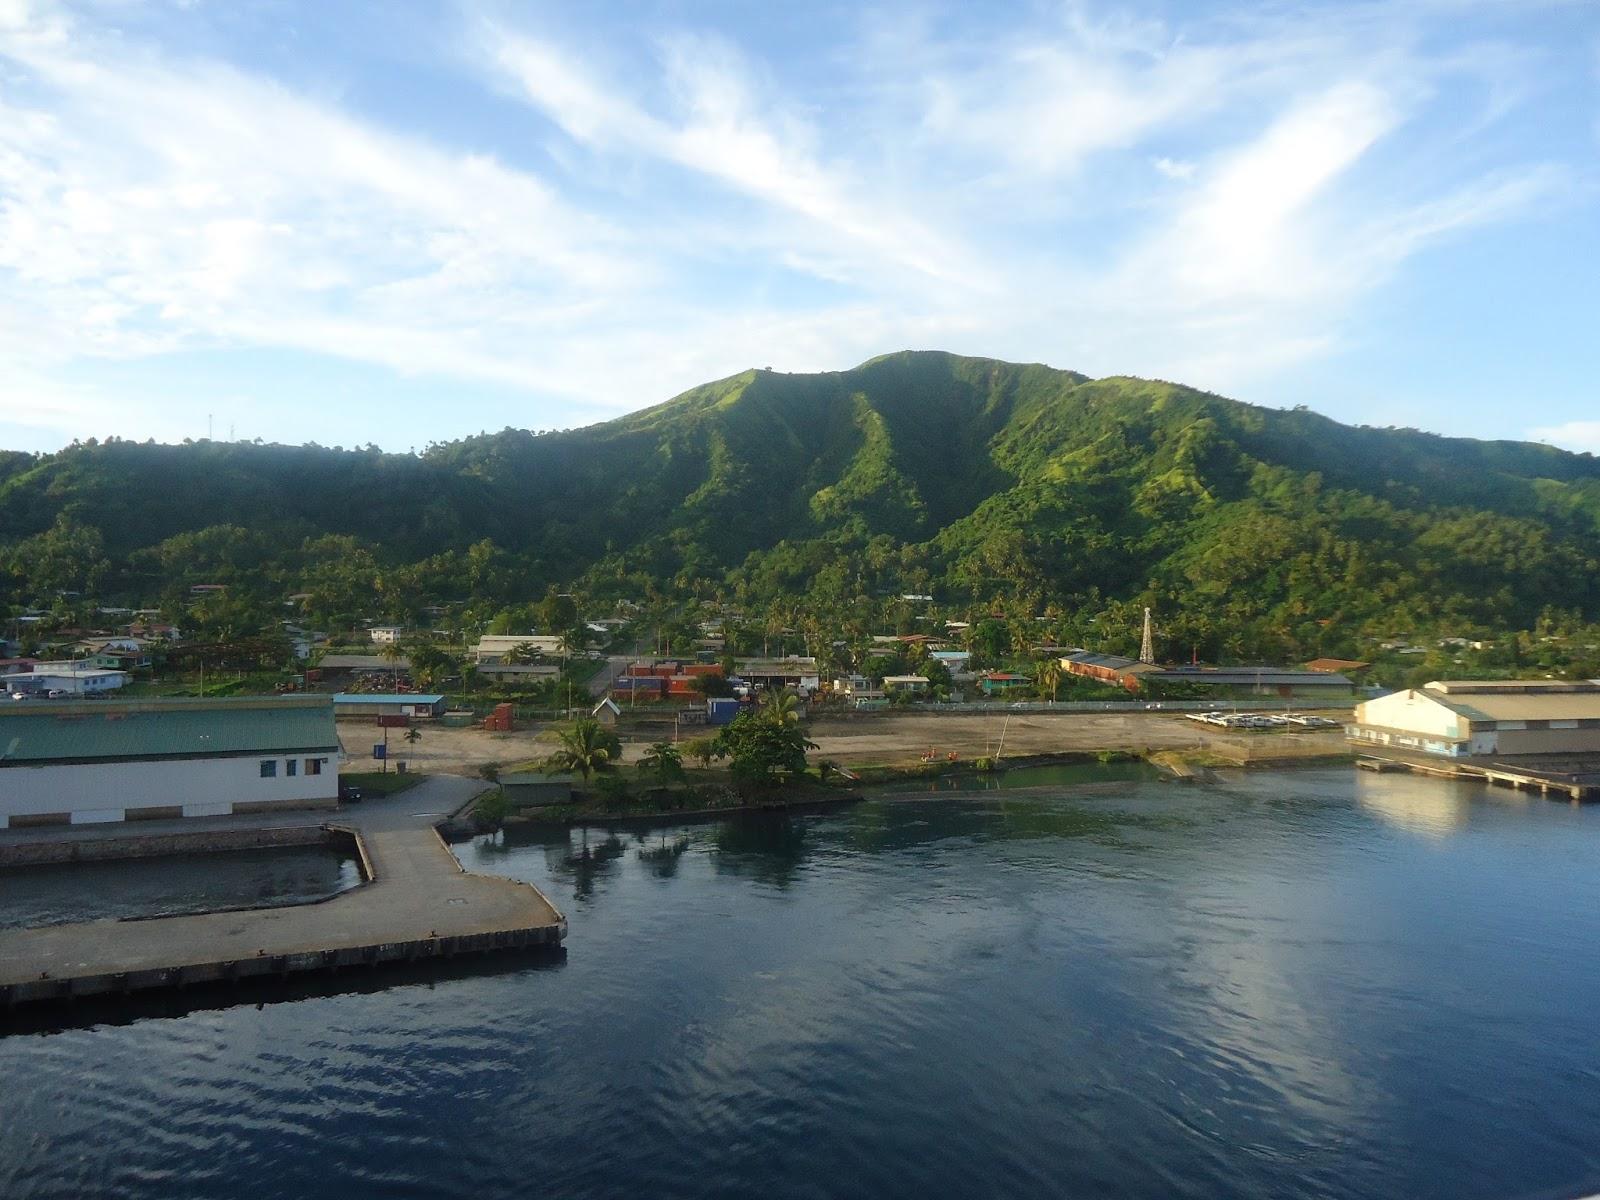 Rabaul-PNG-E-Callender-26 - No Limit Adventures